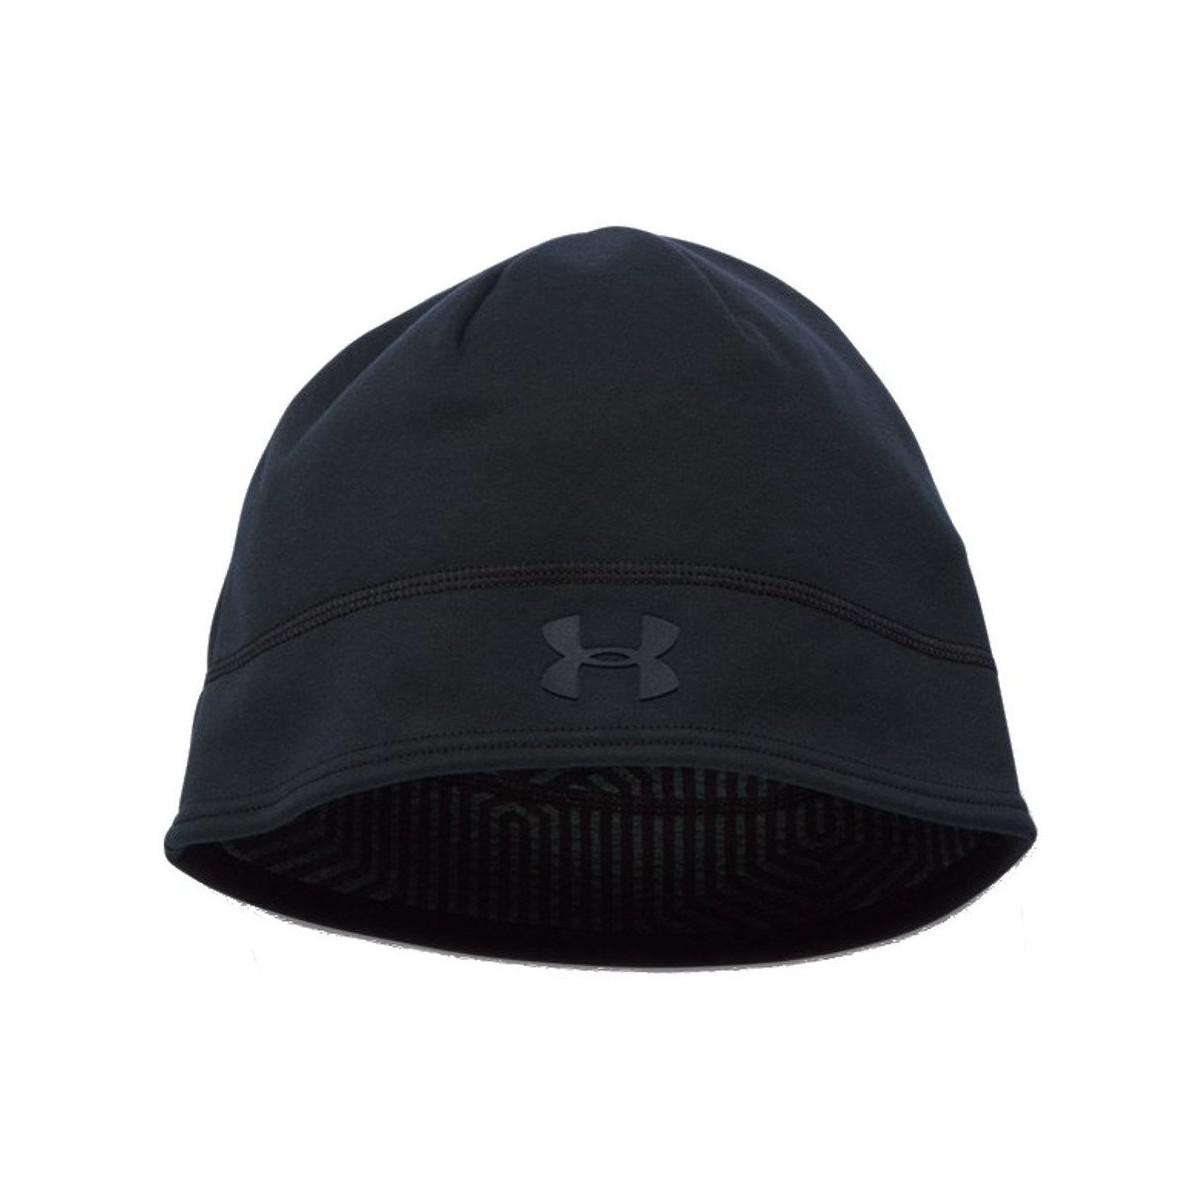 54083e653 Under Armour Womens Elements Fleece Beanie - Black Women's Beanie In Black